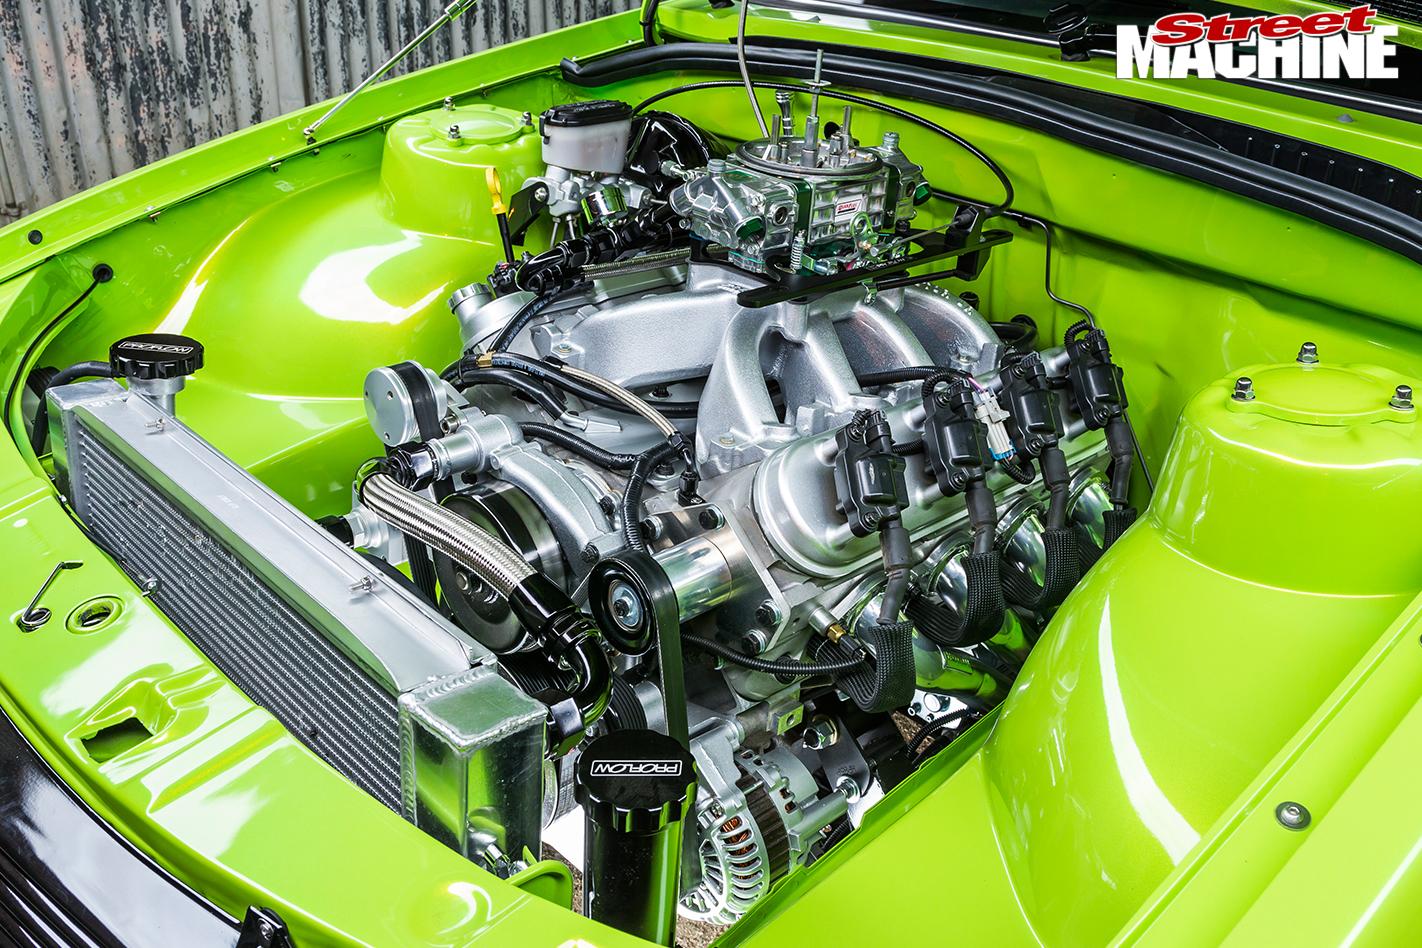 Holden -VH-Vacationer -Wagon -Engine -side